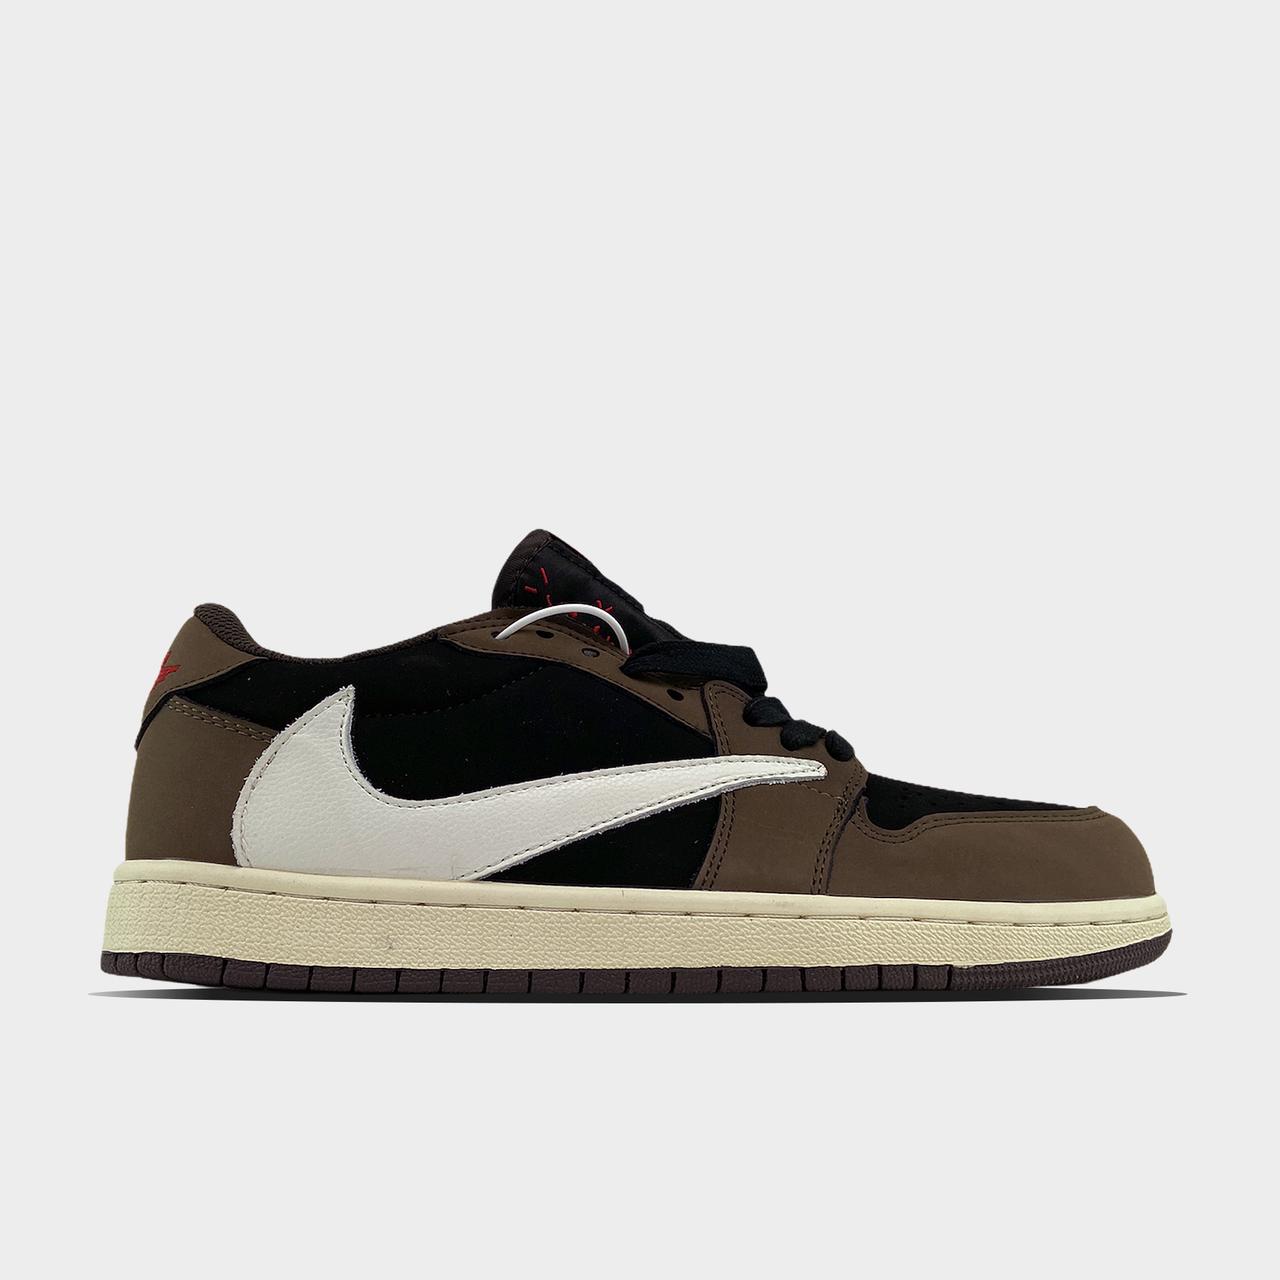 Nike Air Jordan 1 Low Brown Travis Scott (Коричневий)